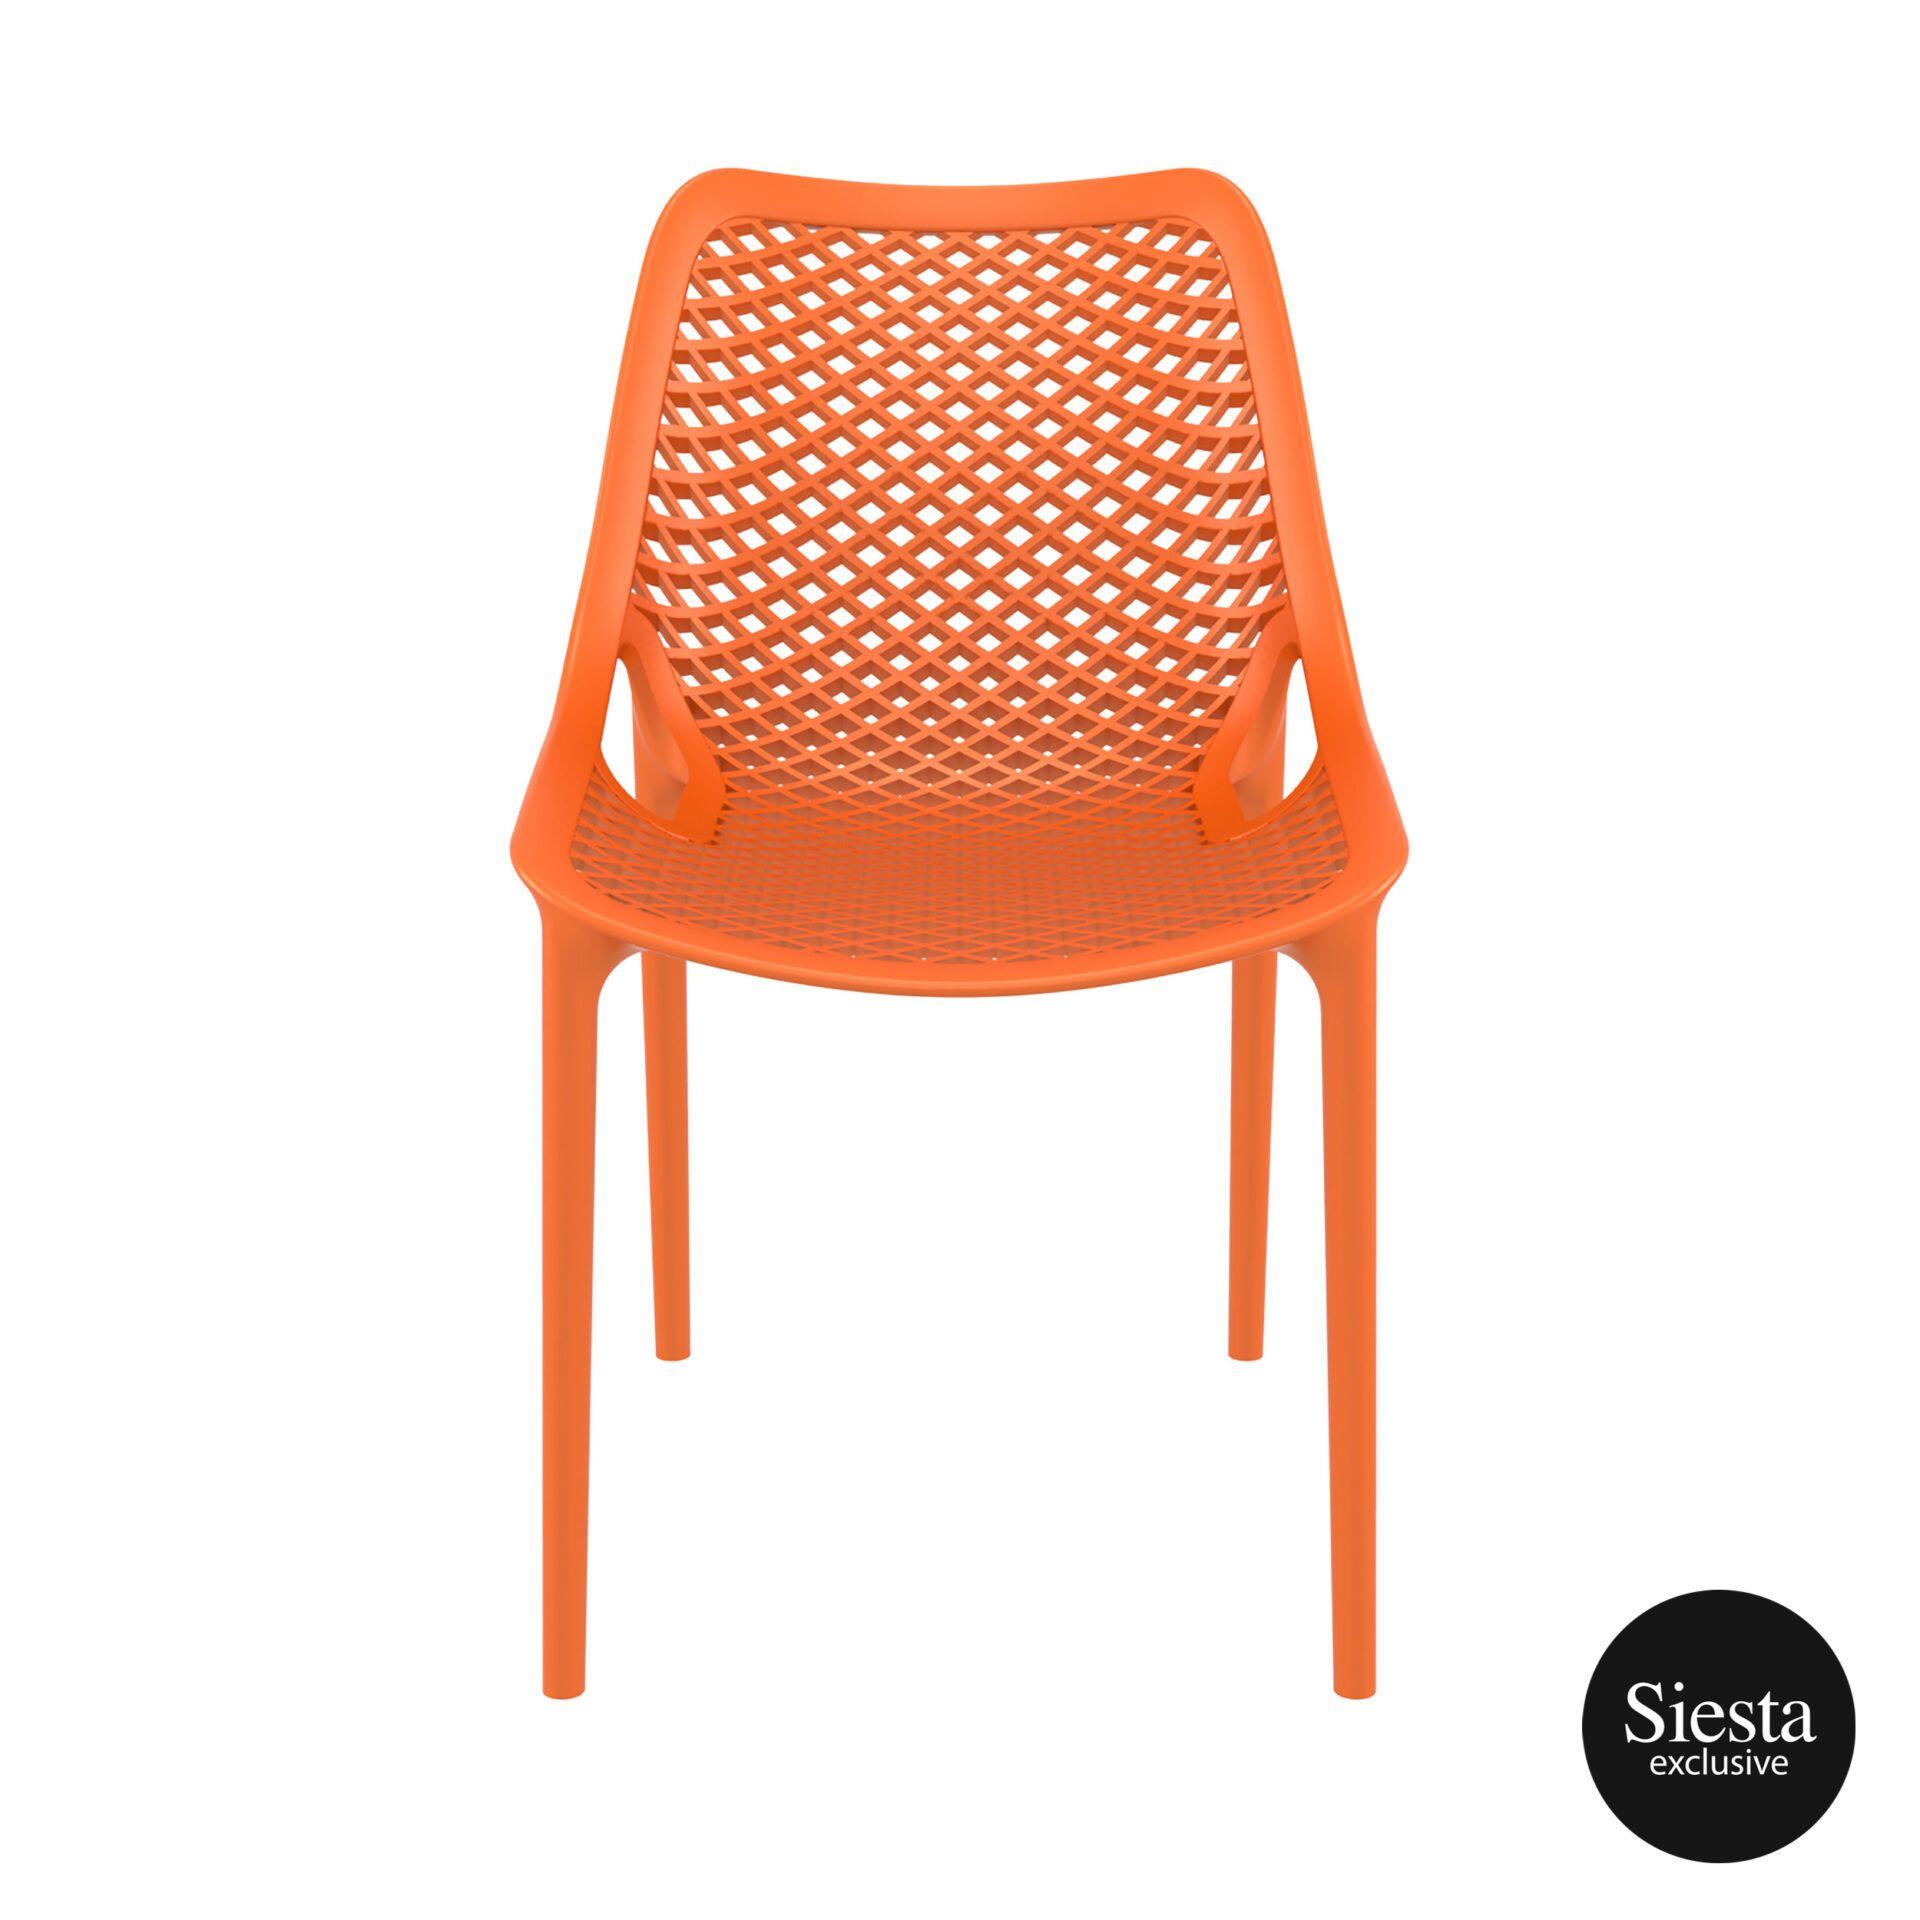 original siesta air chair orange front 1